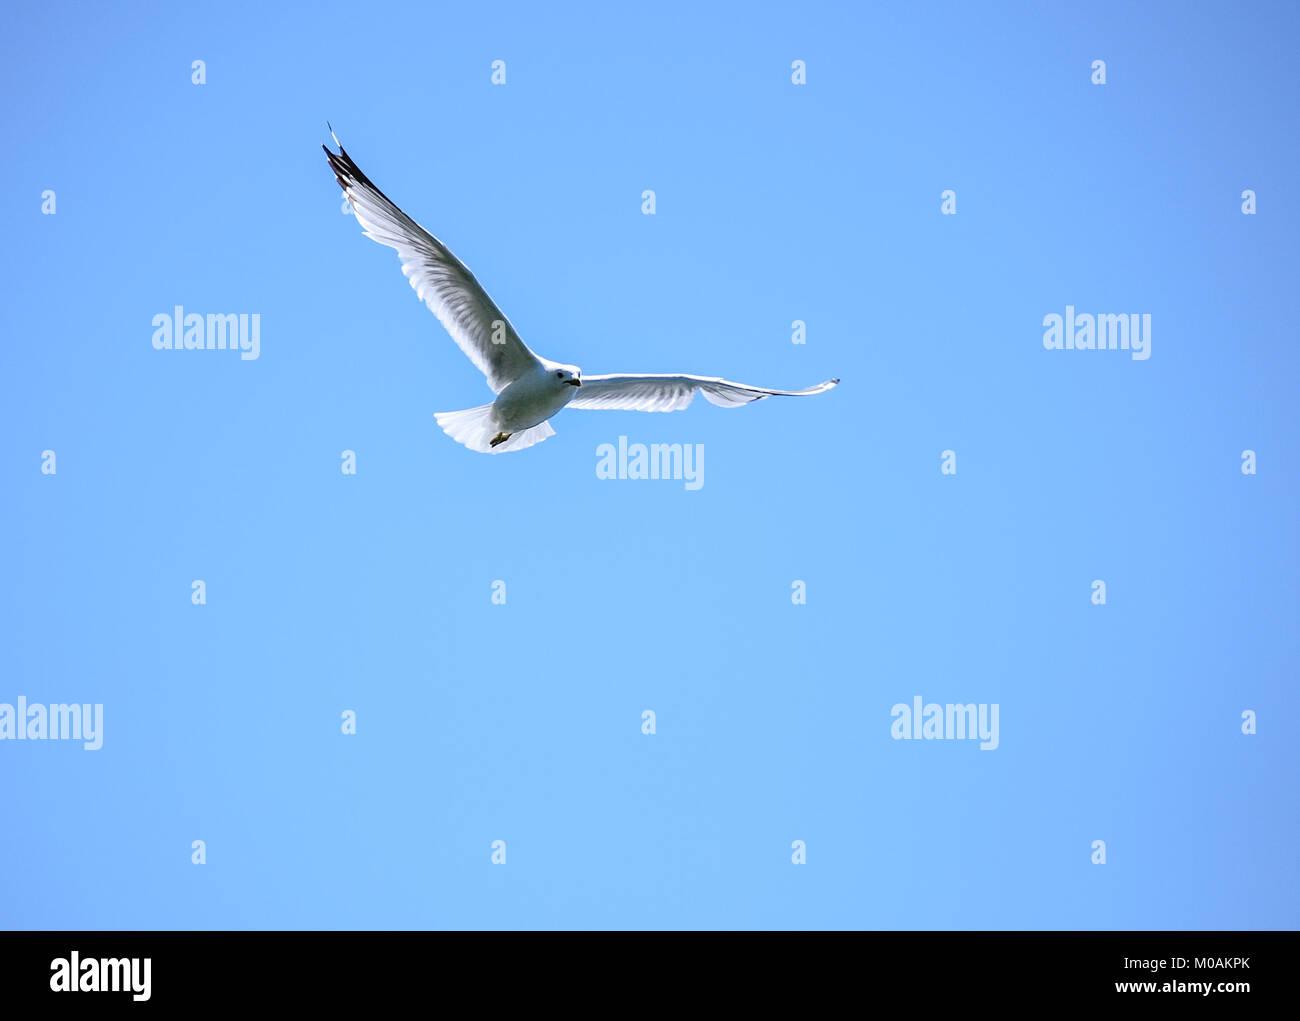 White Bird Soaring - Stock Image